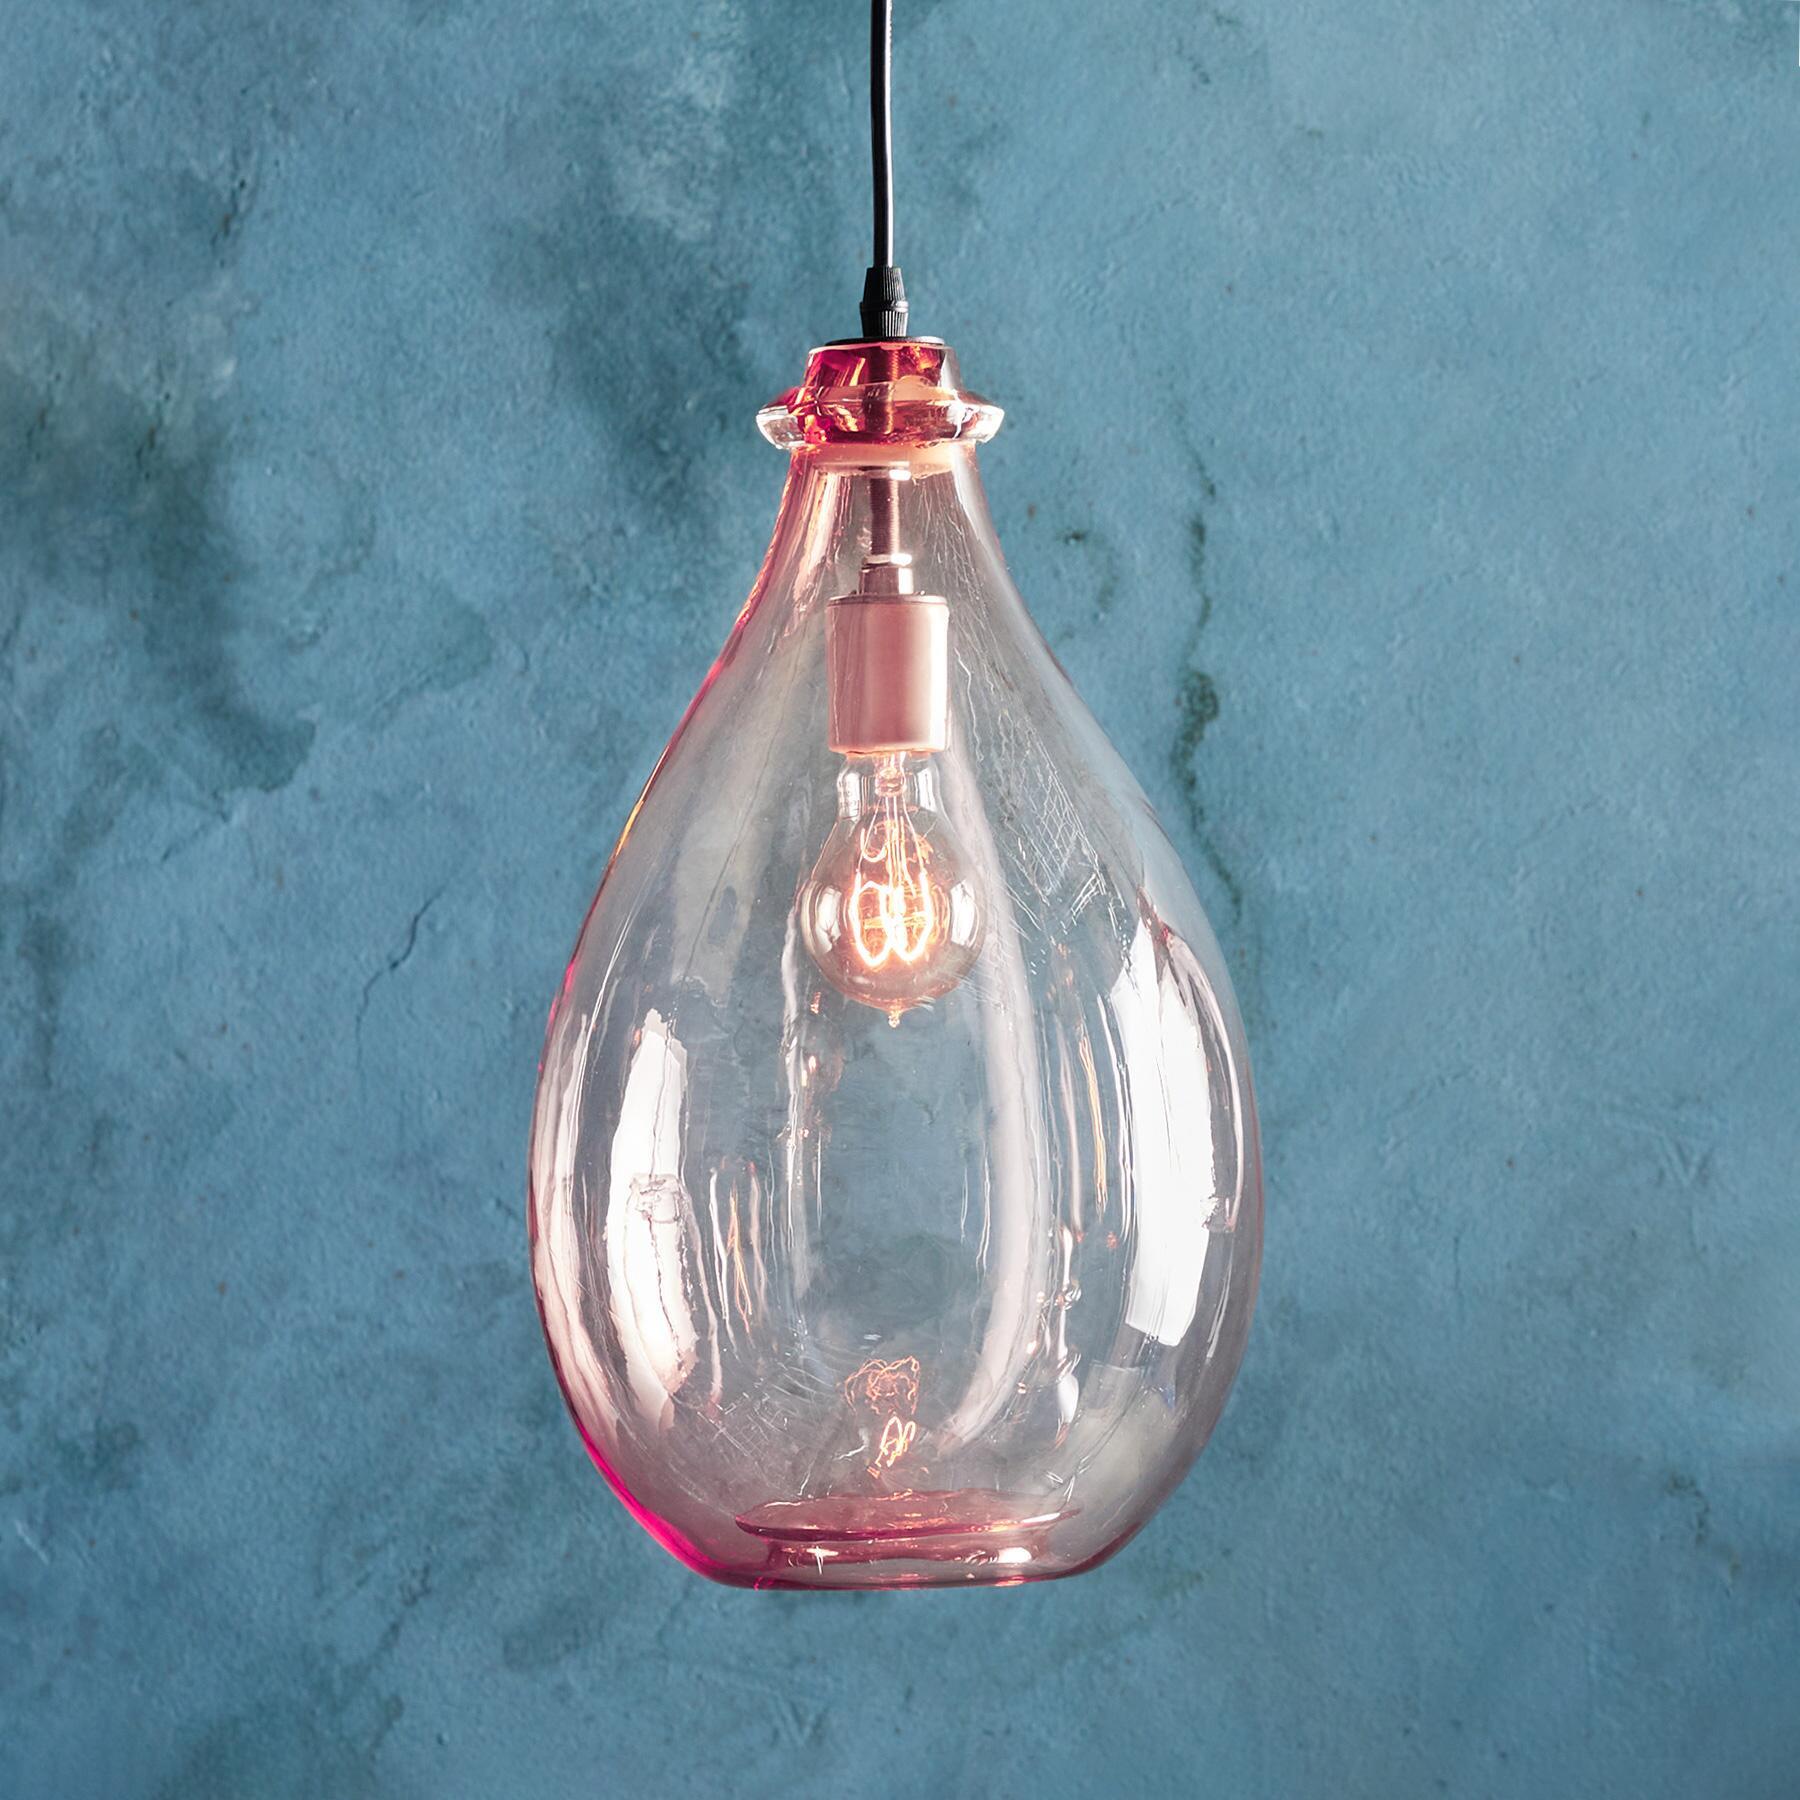 SALON GLASS OVAL PENDANT LIGHT: View 1